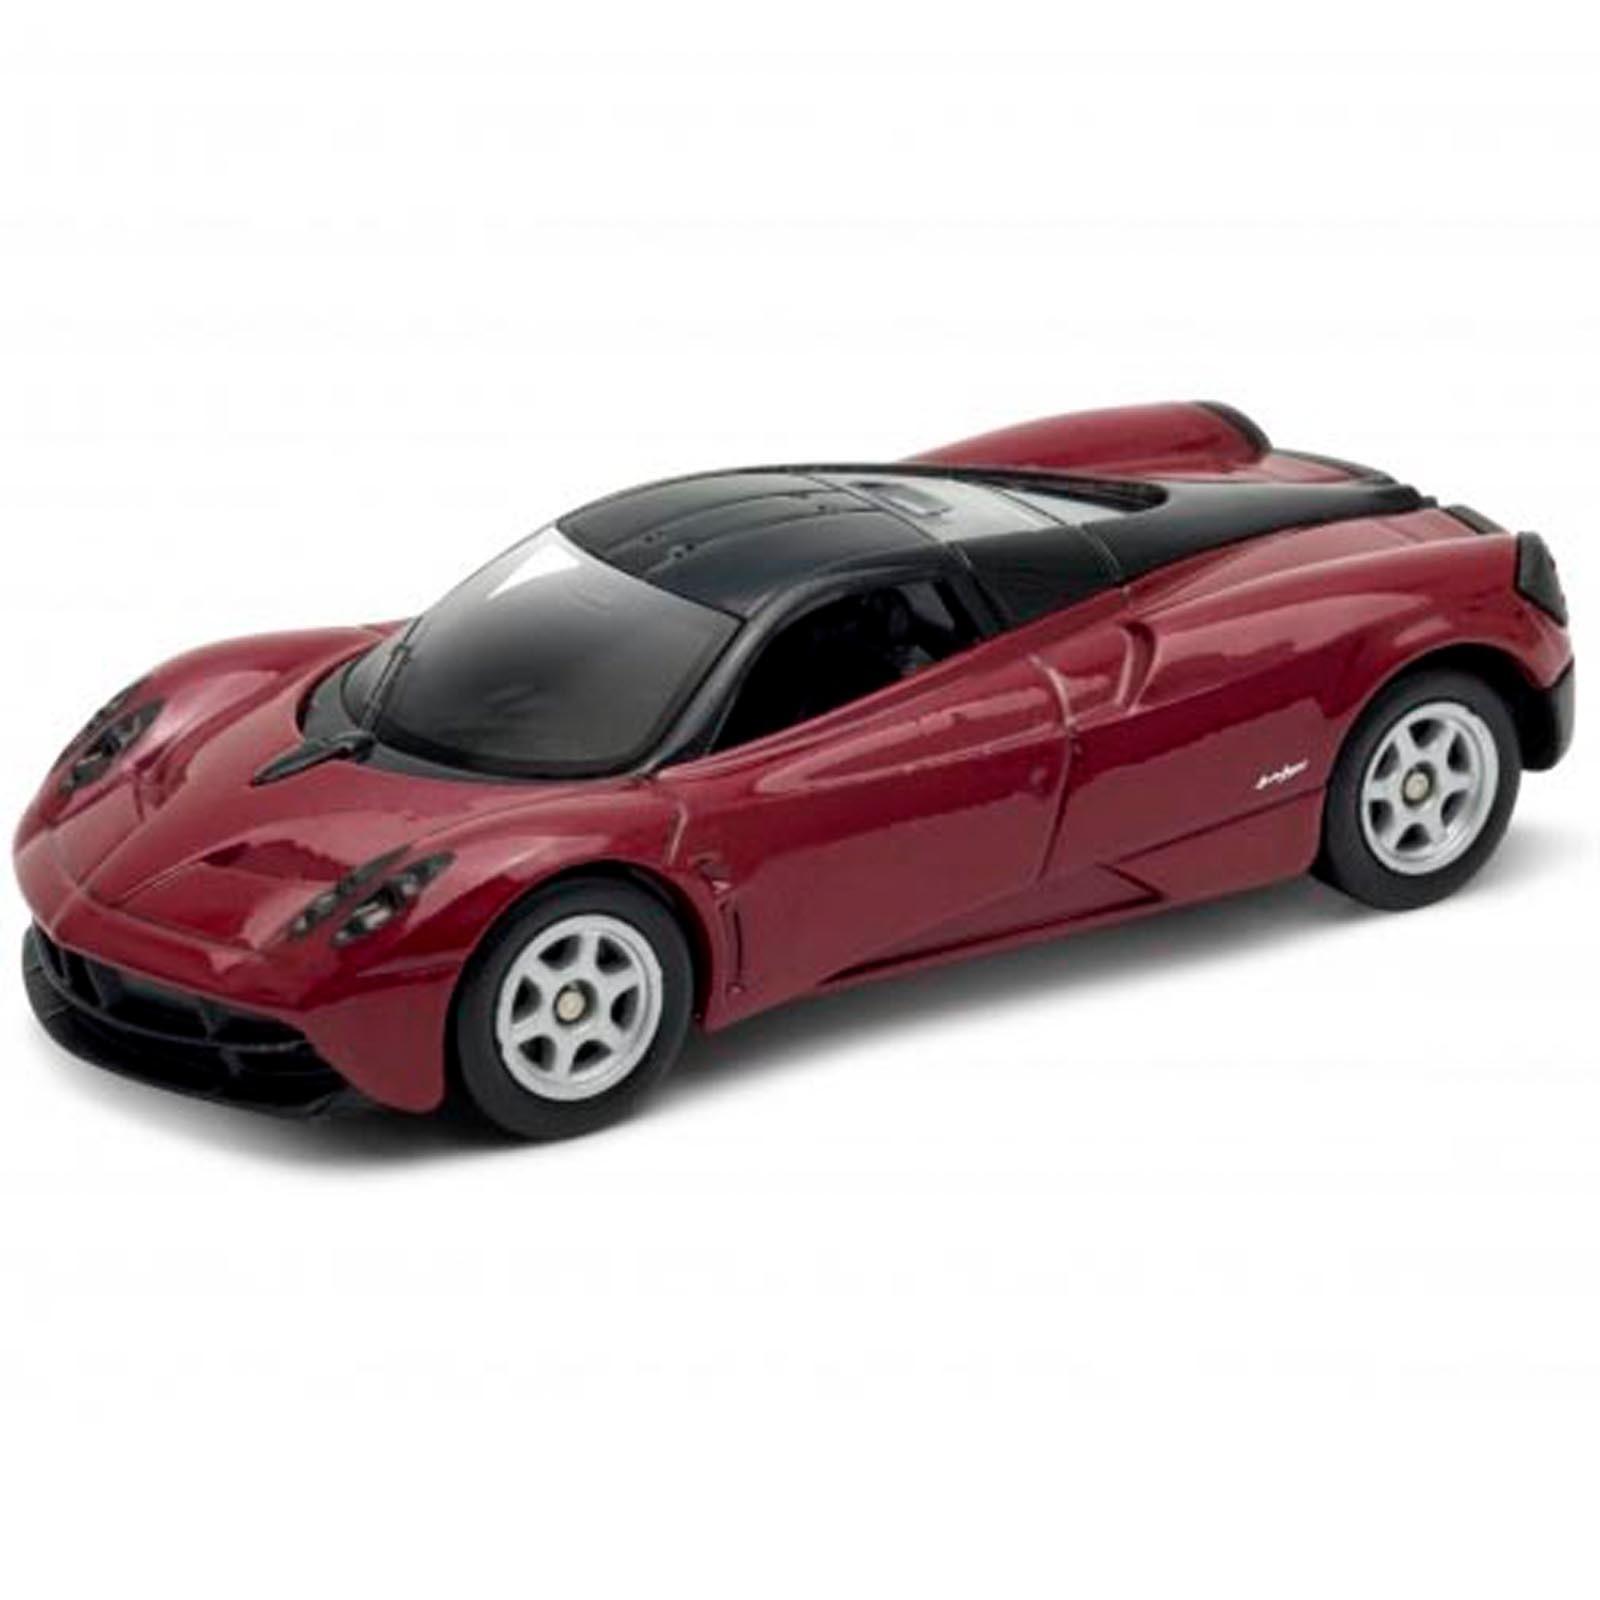 Miniatura - 1:64 - Pagani Huayra - California Minis - Welly